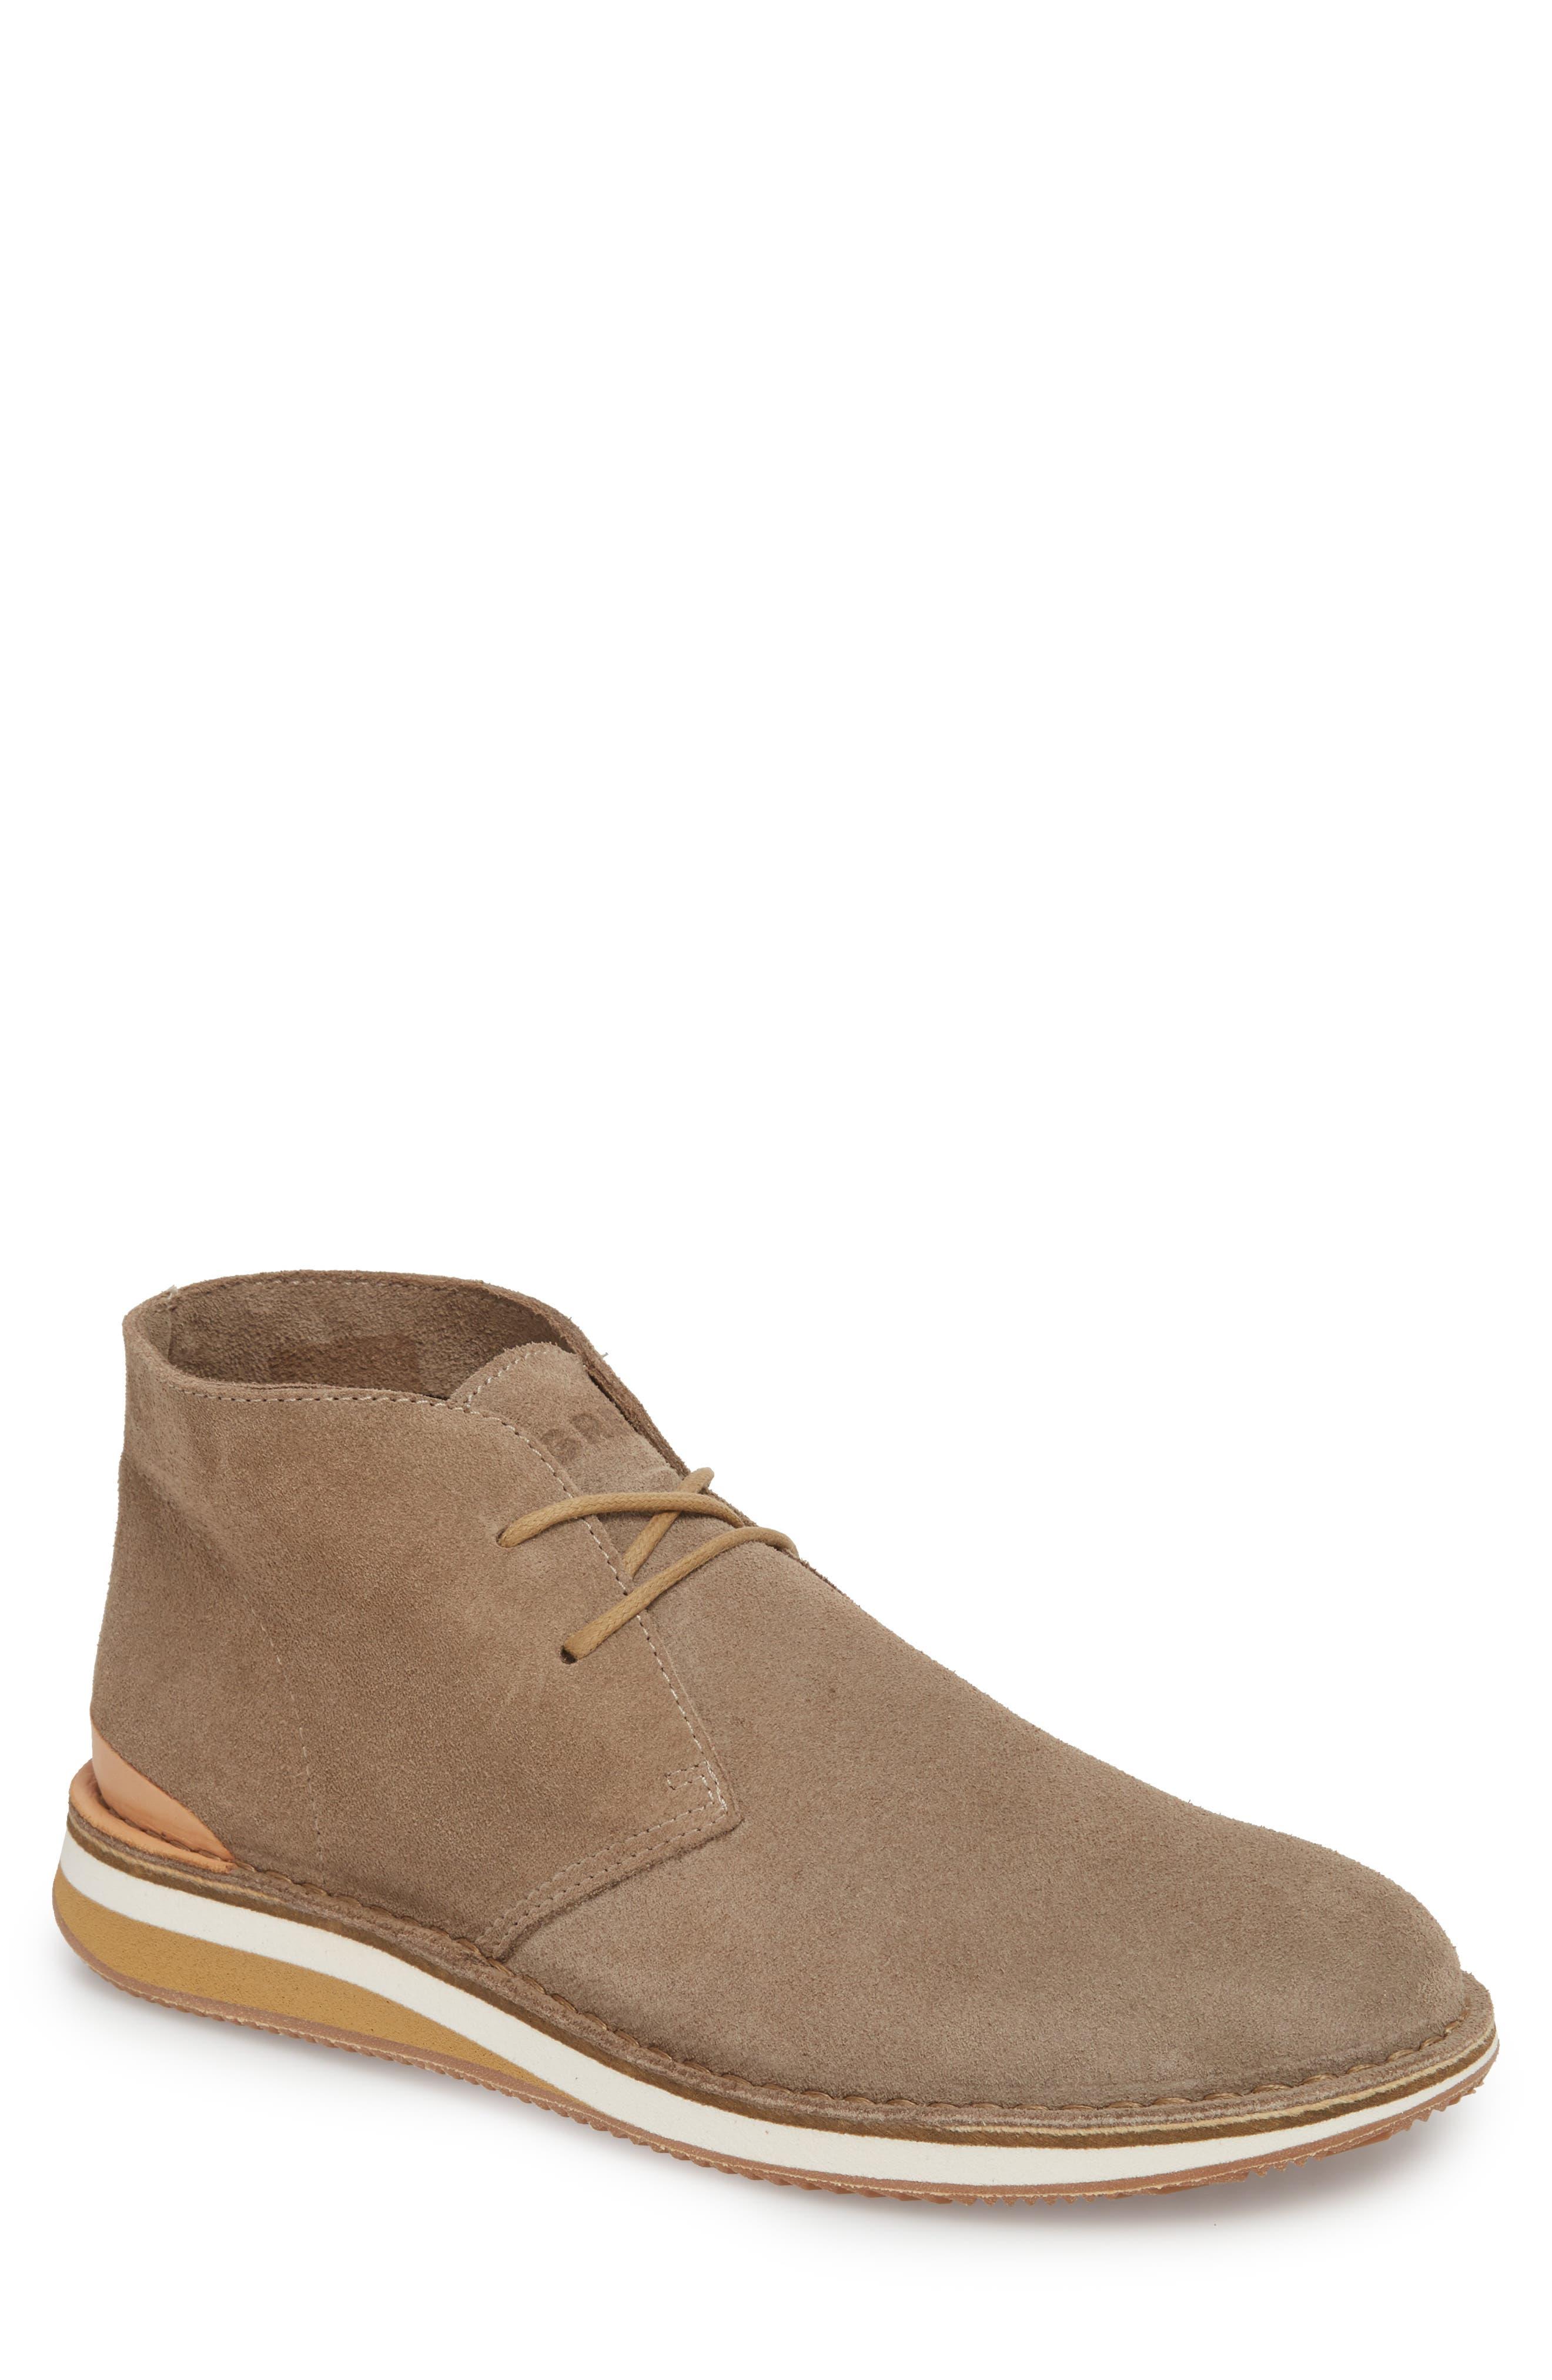 Hirsh Chukka Boot,                         Main,                         color, Light Beige Suede